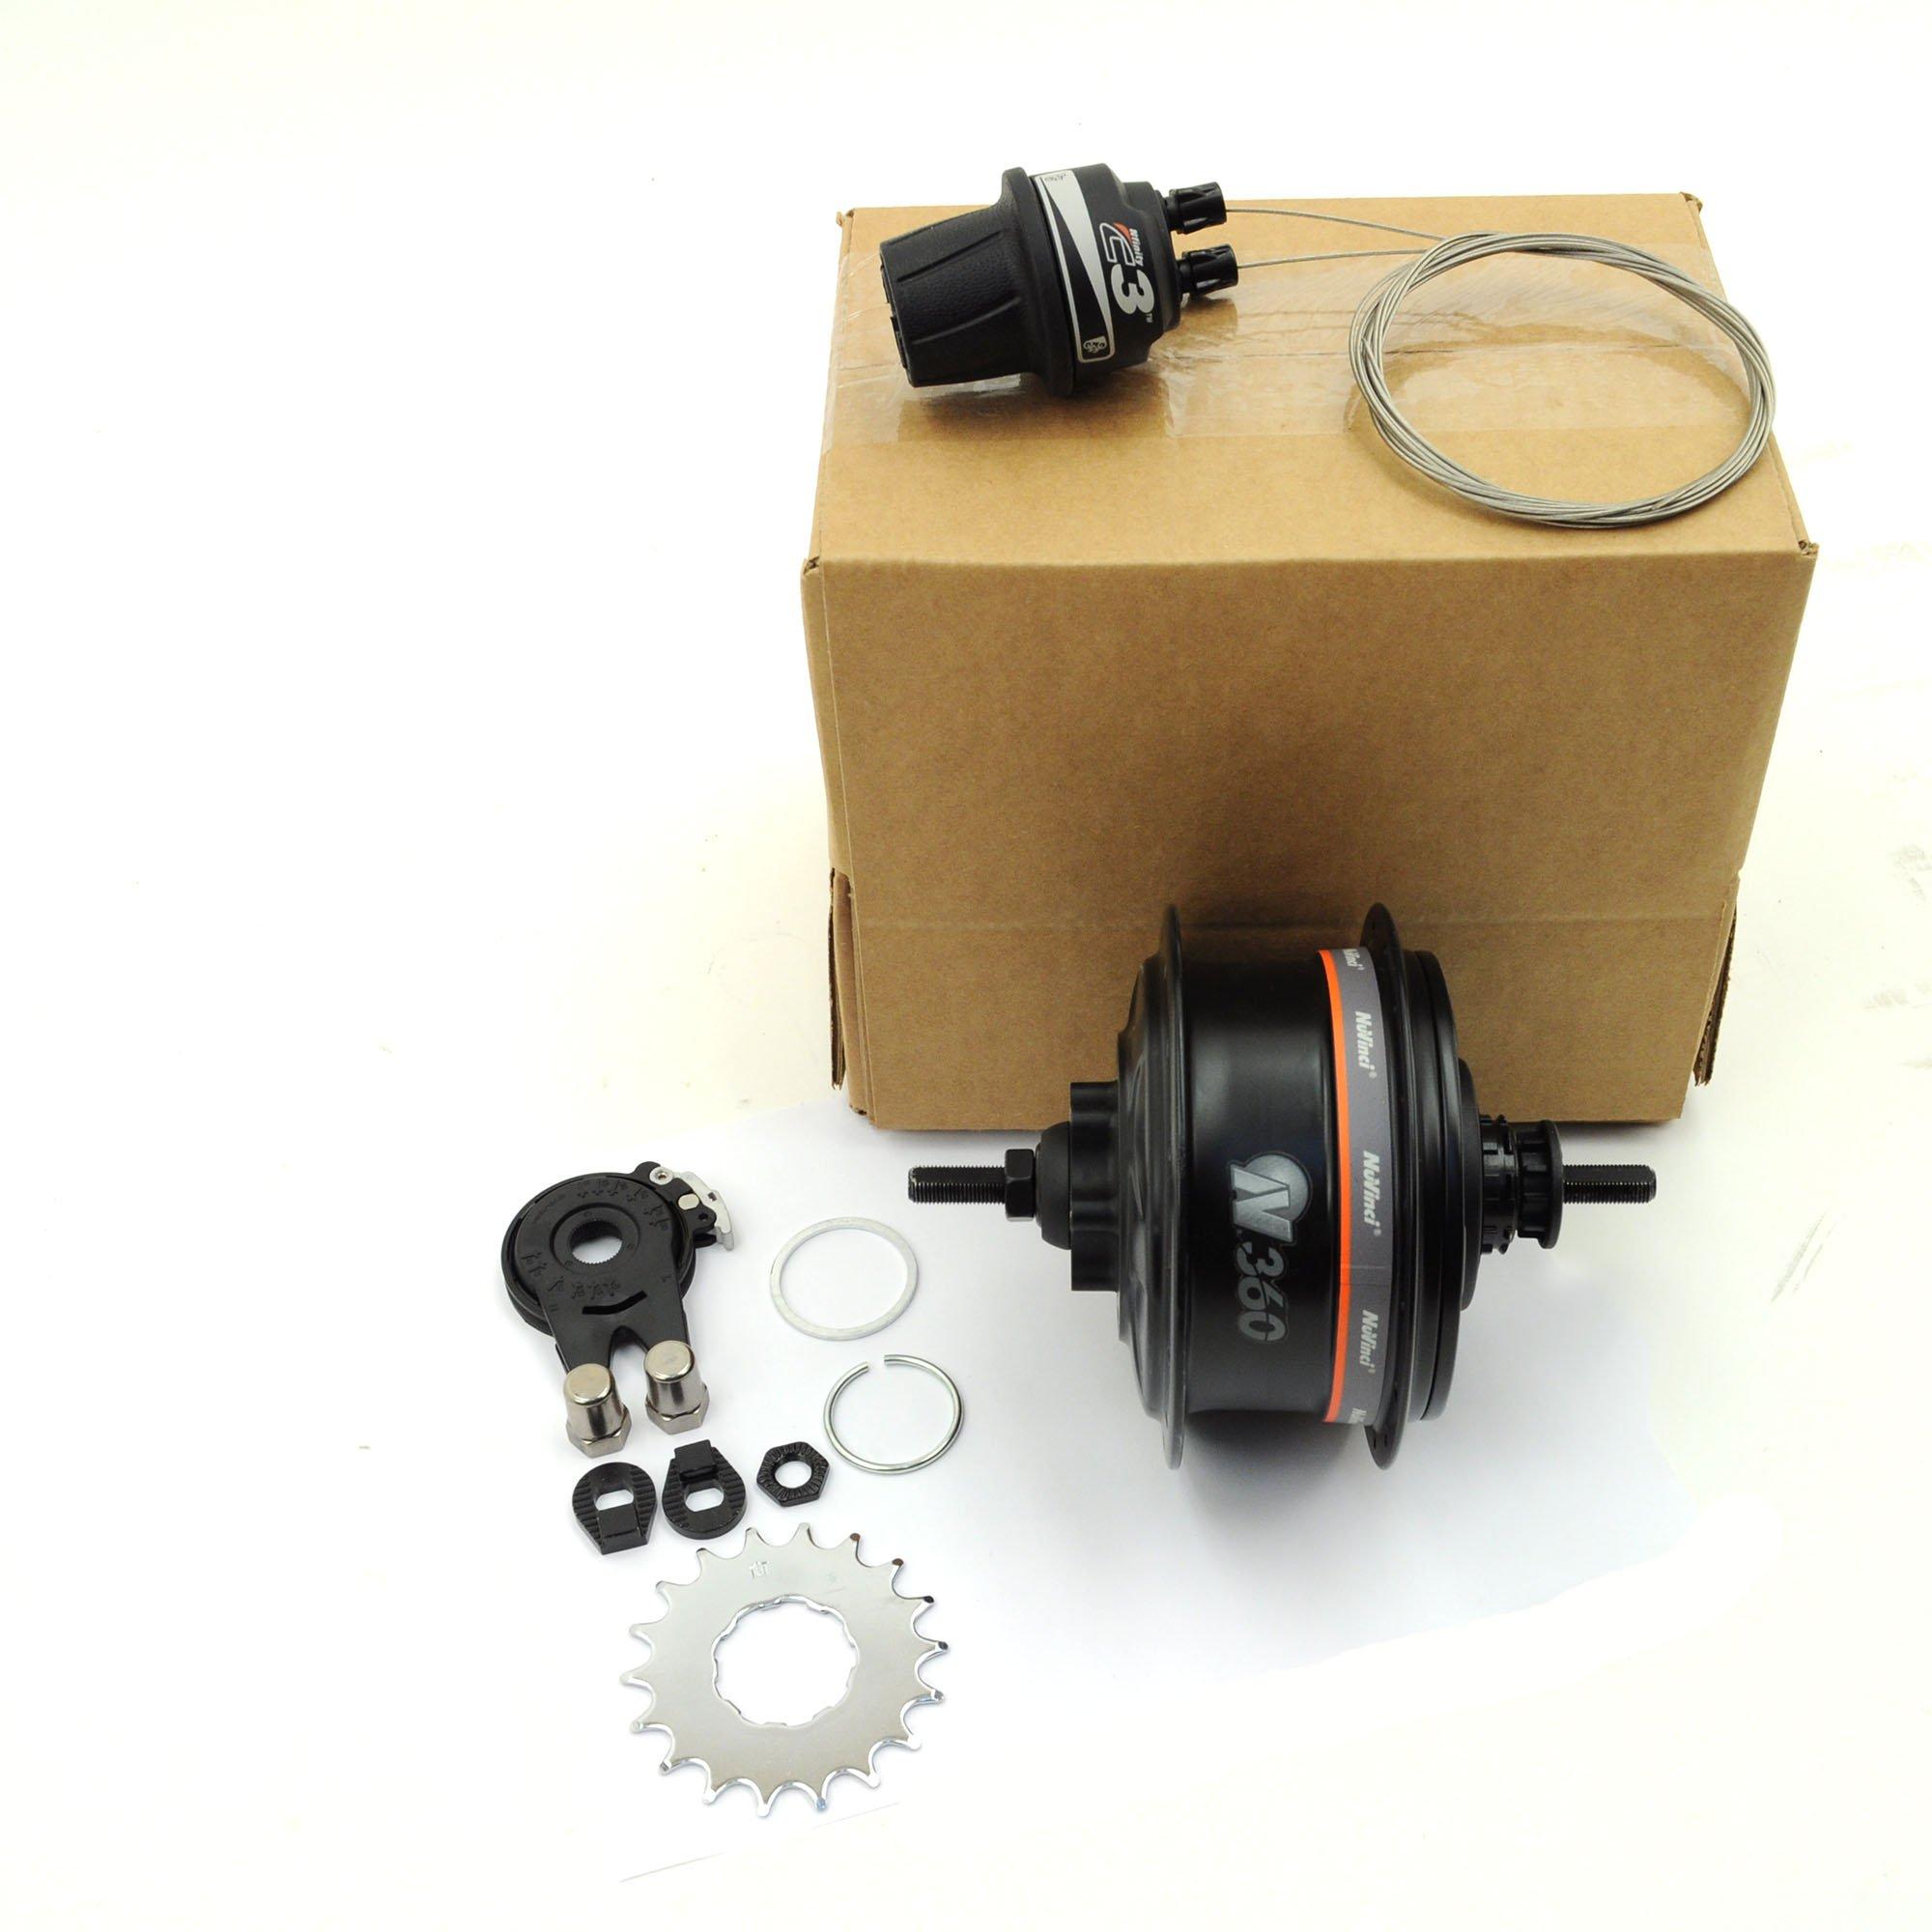 NuVinci N330 CVP Internal Gear Bicycle Rear Hub Silver 36h Roller Brake C3